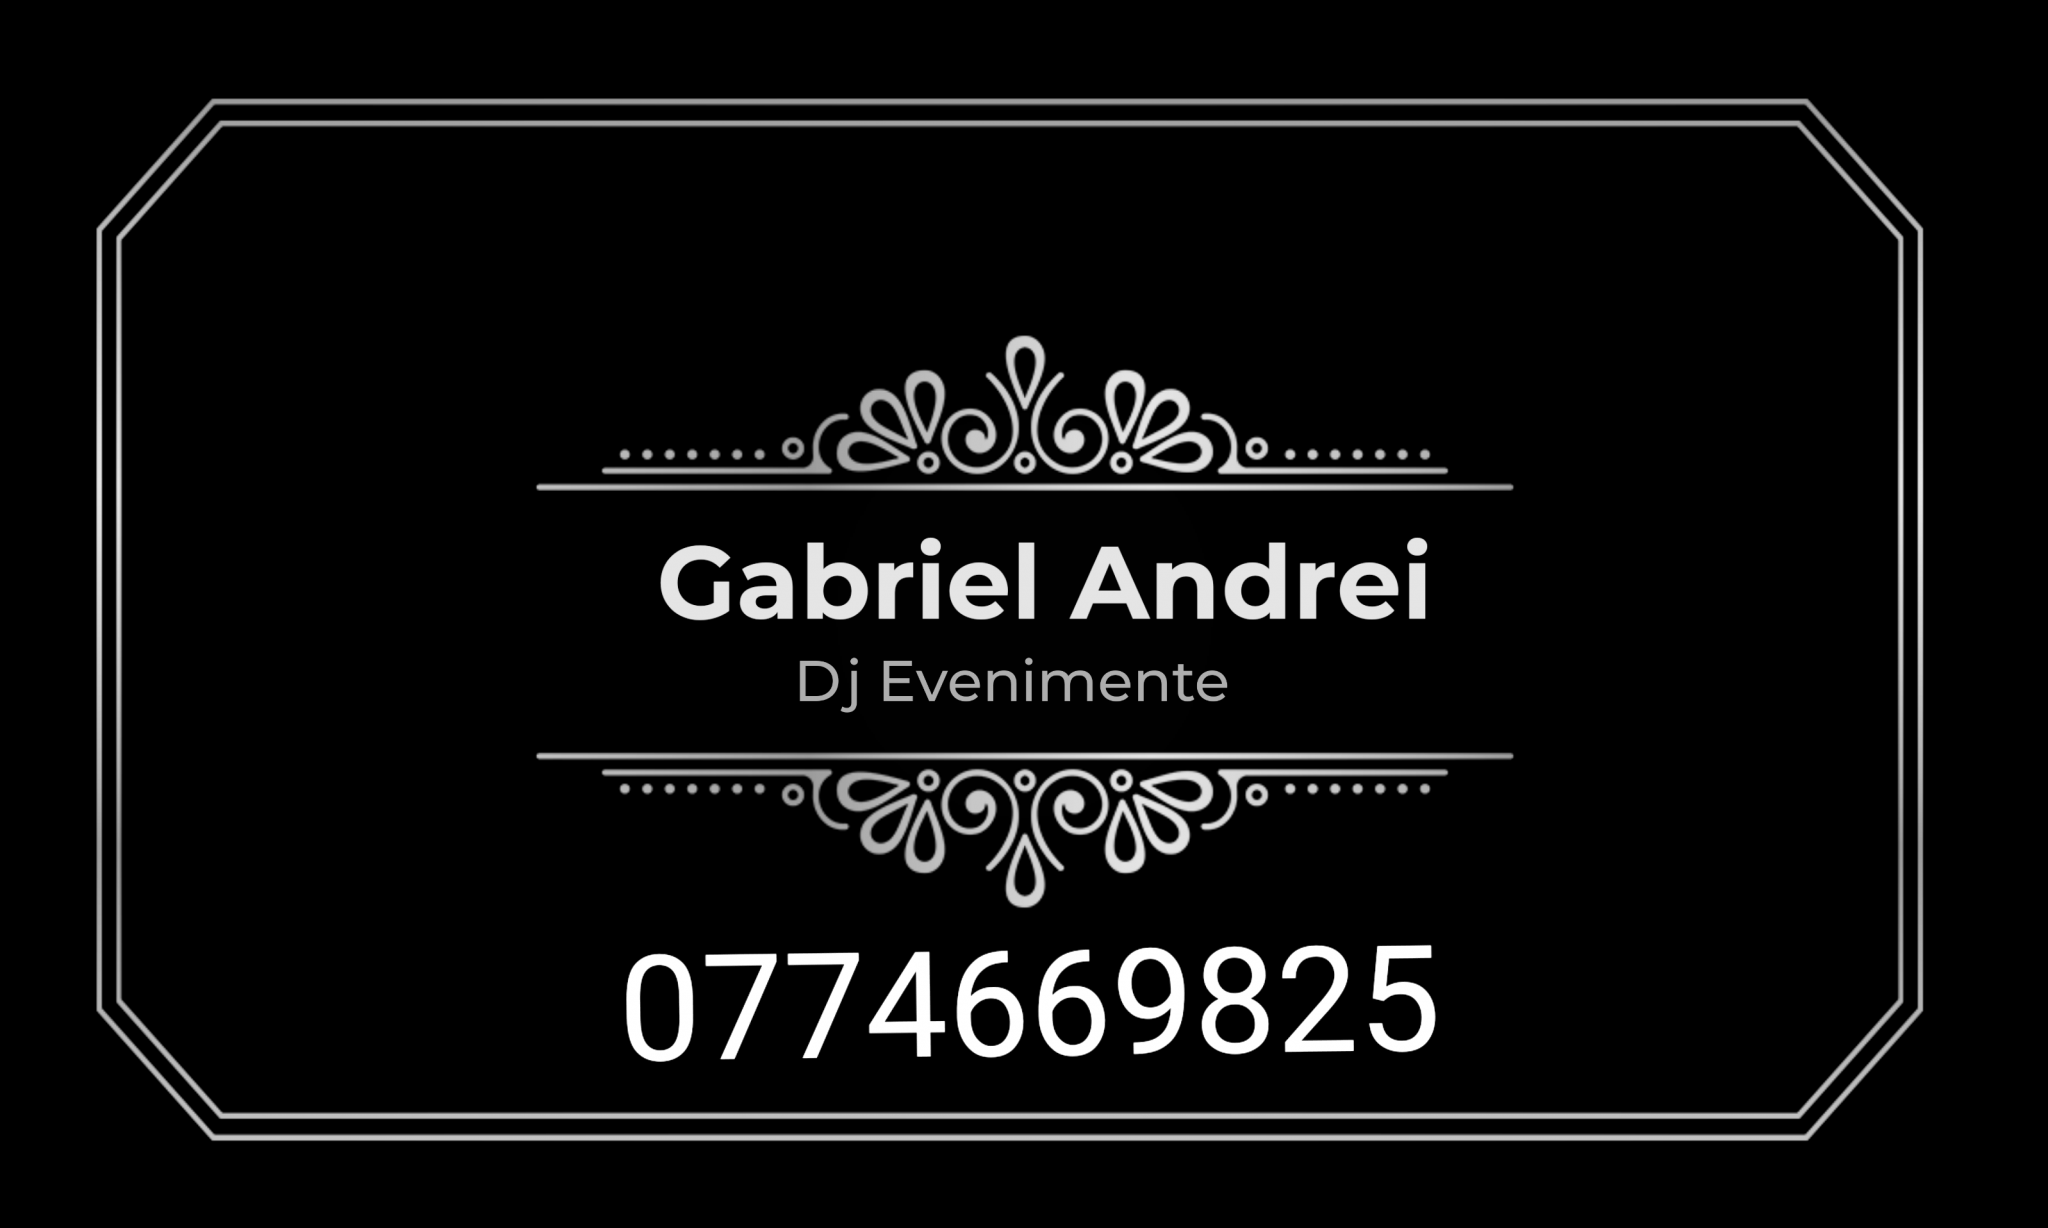 Gabriel Andrei